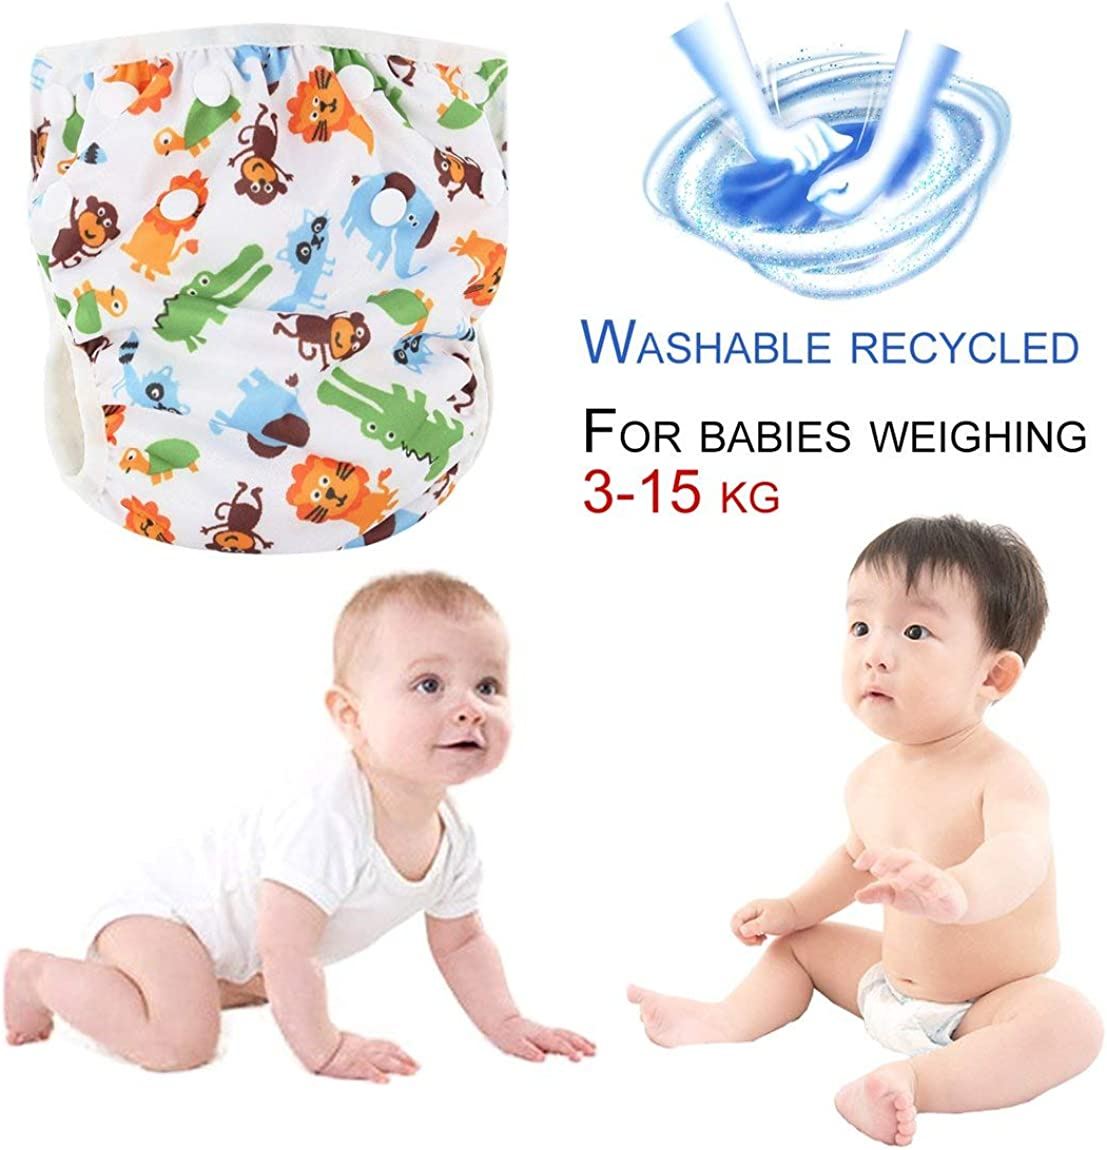 SeniorMar Washable Baby Unisex Adjustable Swim Diaper Pool Pant Waterproof Reusable Baby Training Swimming Diaper Swimsuit